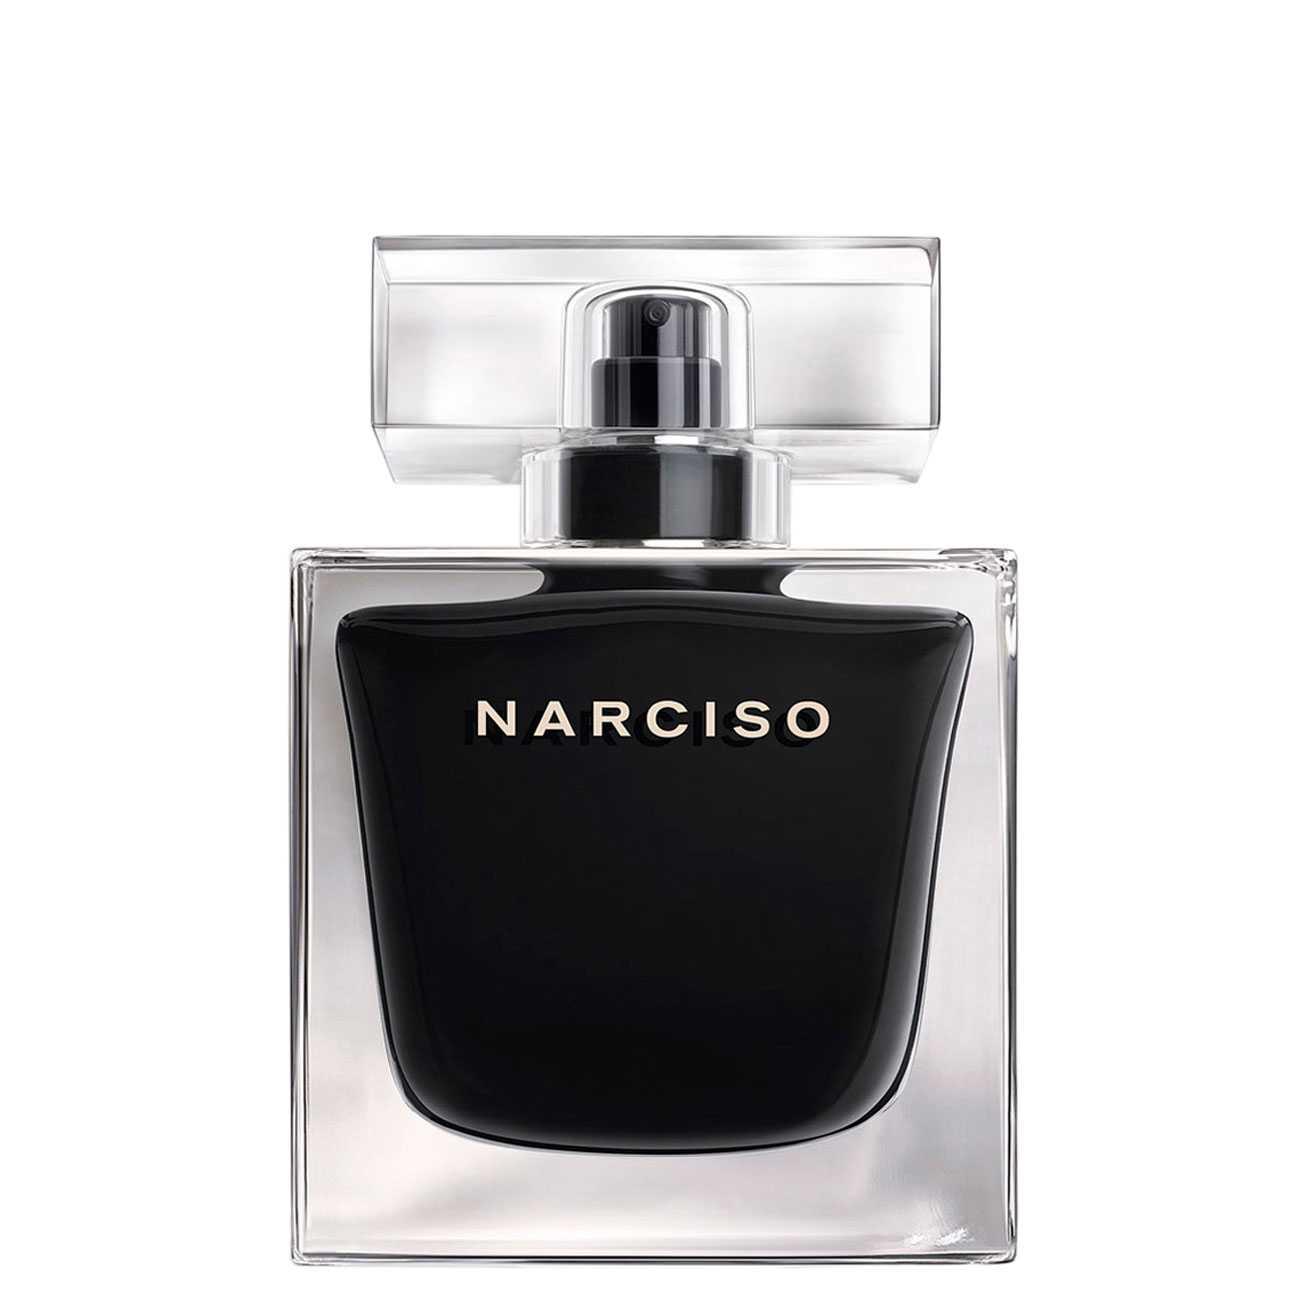 NARCISO 90ml imagine produs